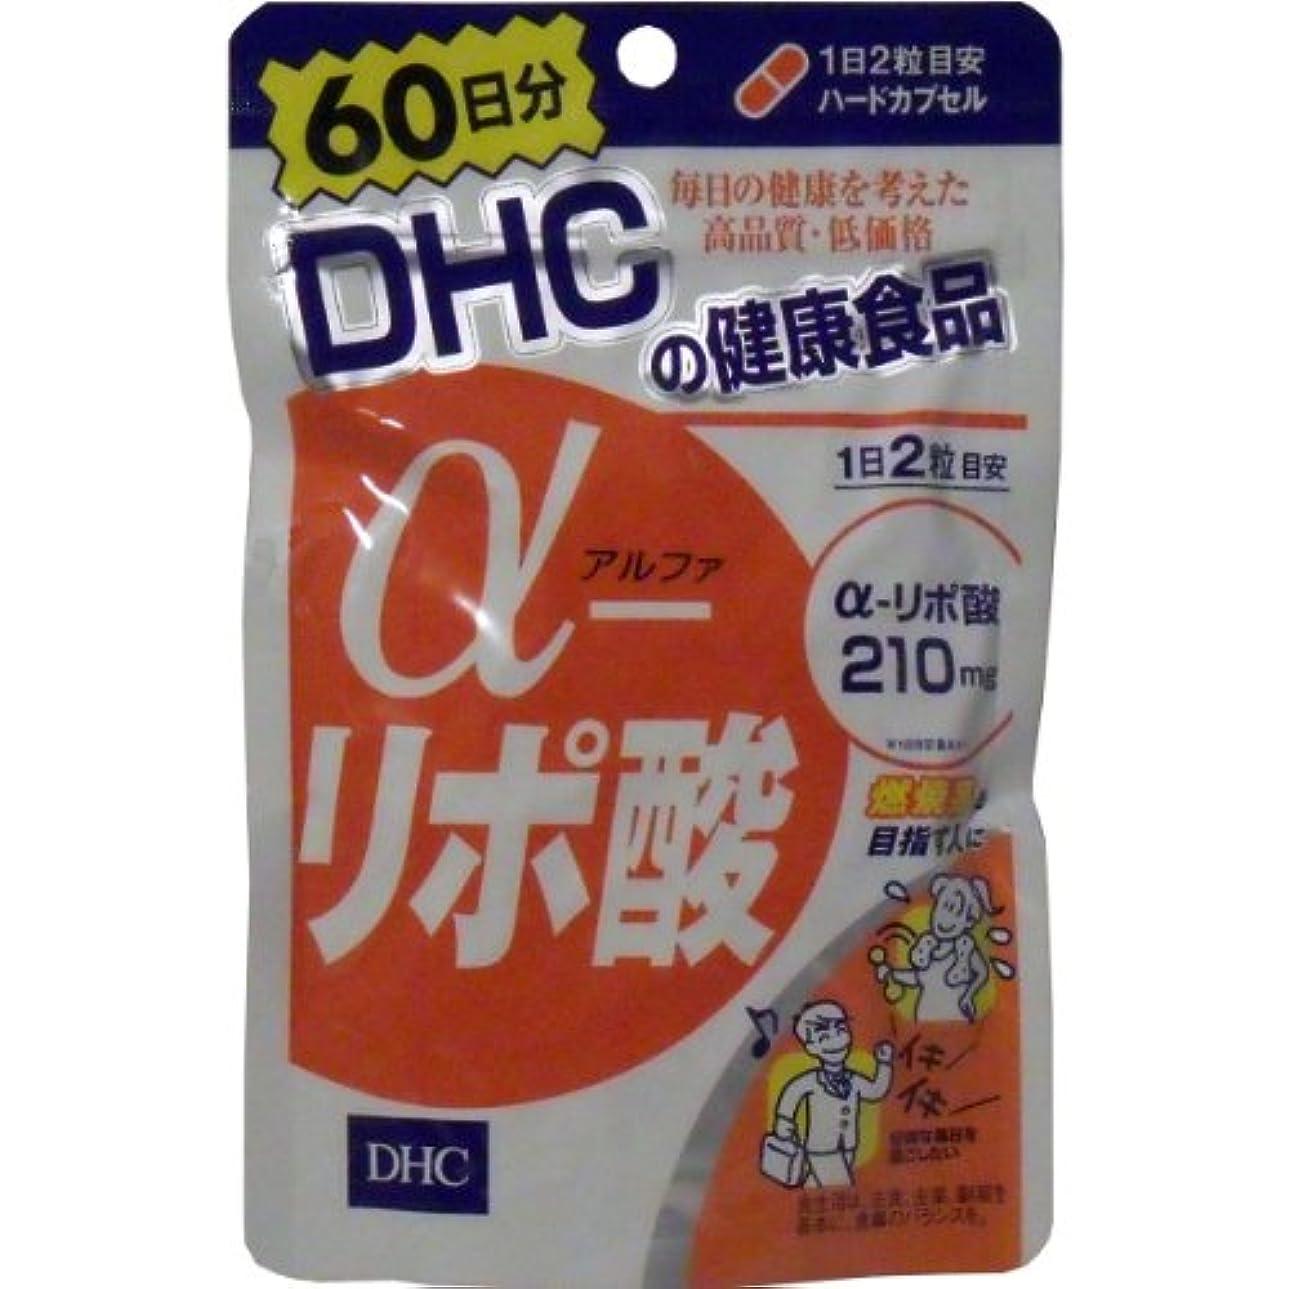 α-リポ酸は、もともと体内にあるエネルギー活性成分。サプリメントでの効率的な補給がおすすめ!DHC120粒 60日分